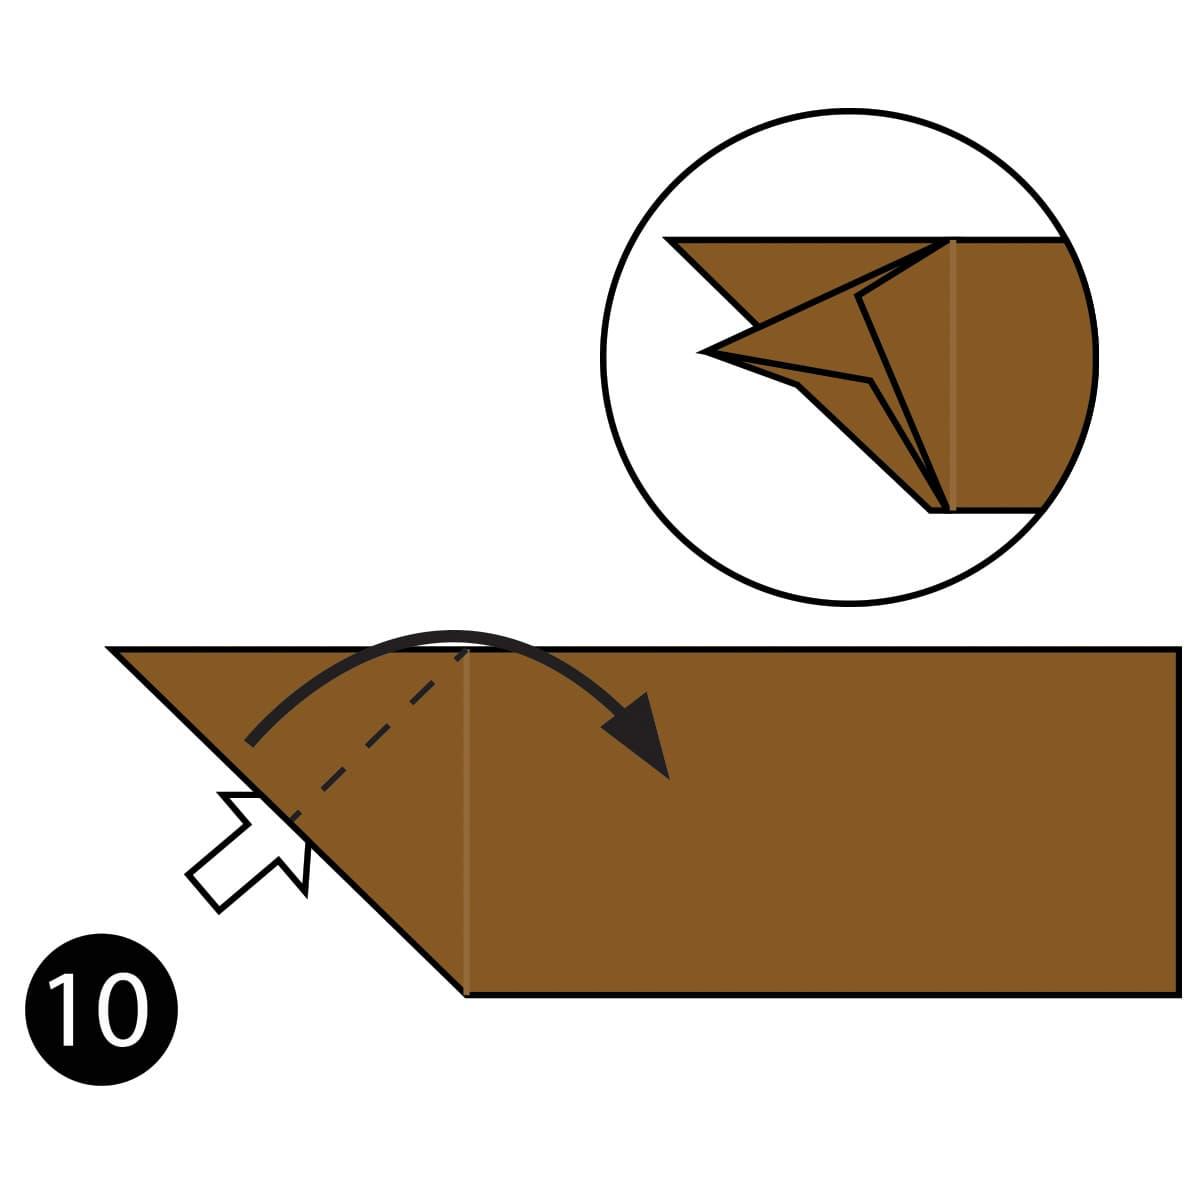 Koala Step 10